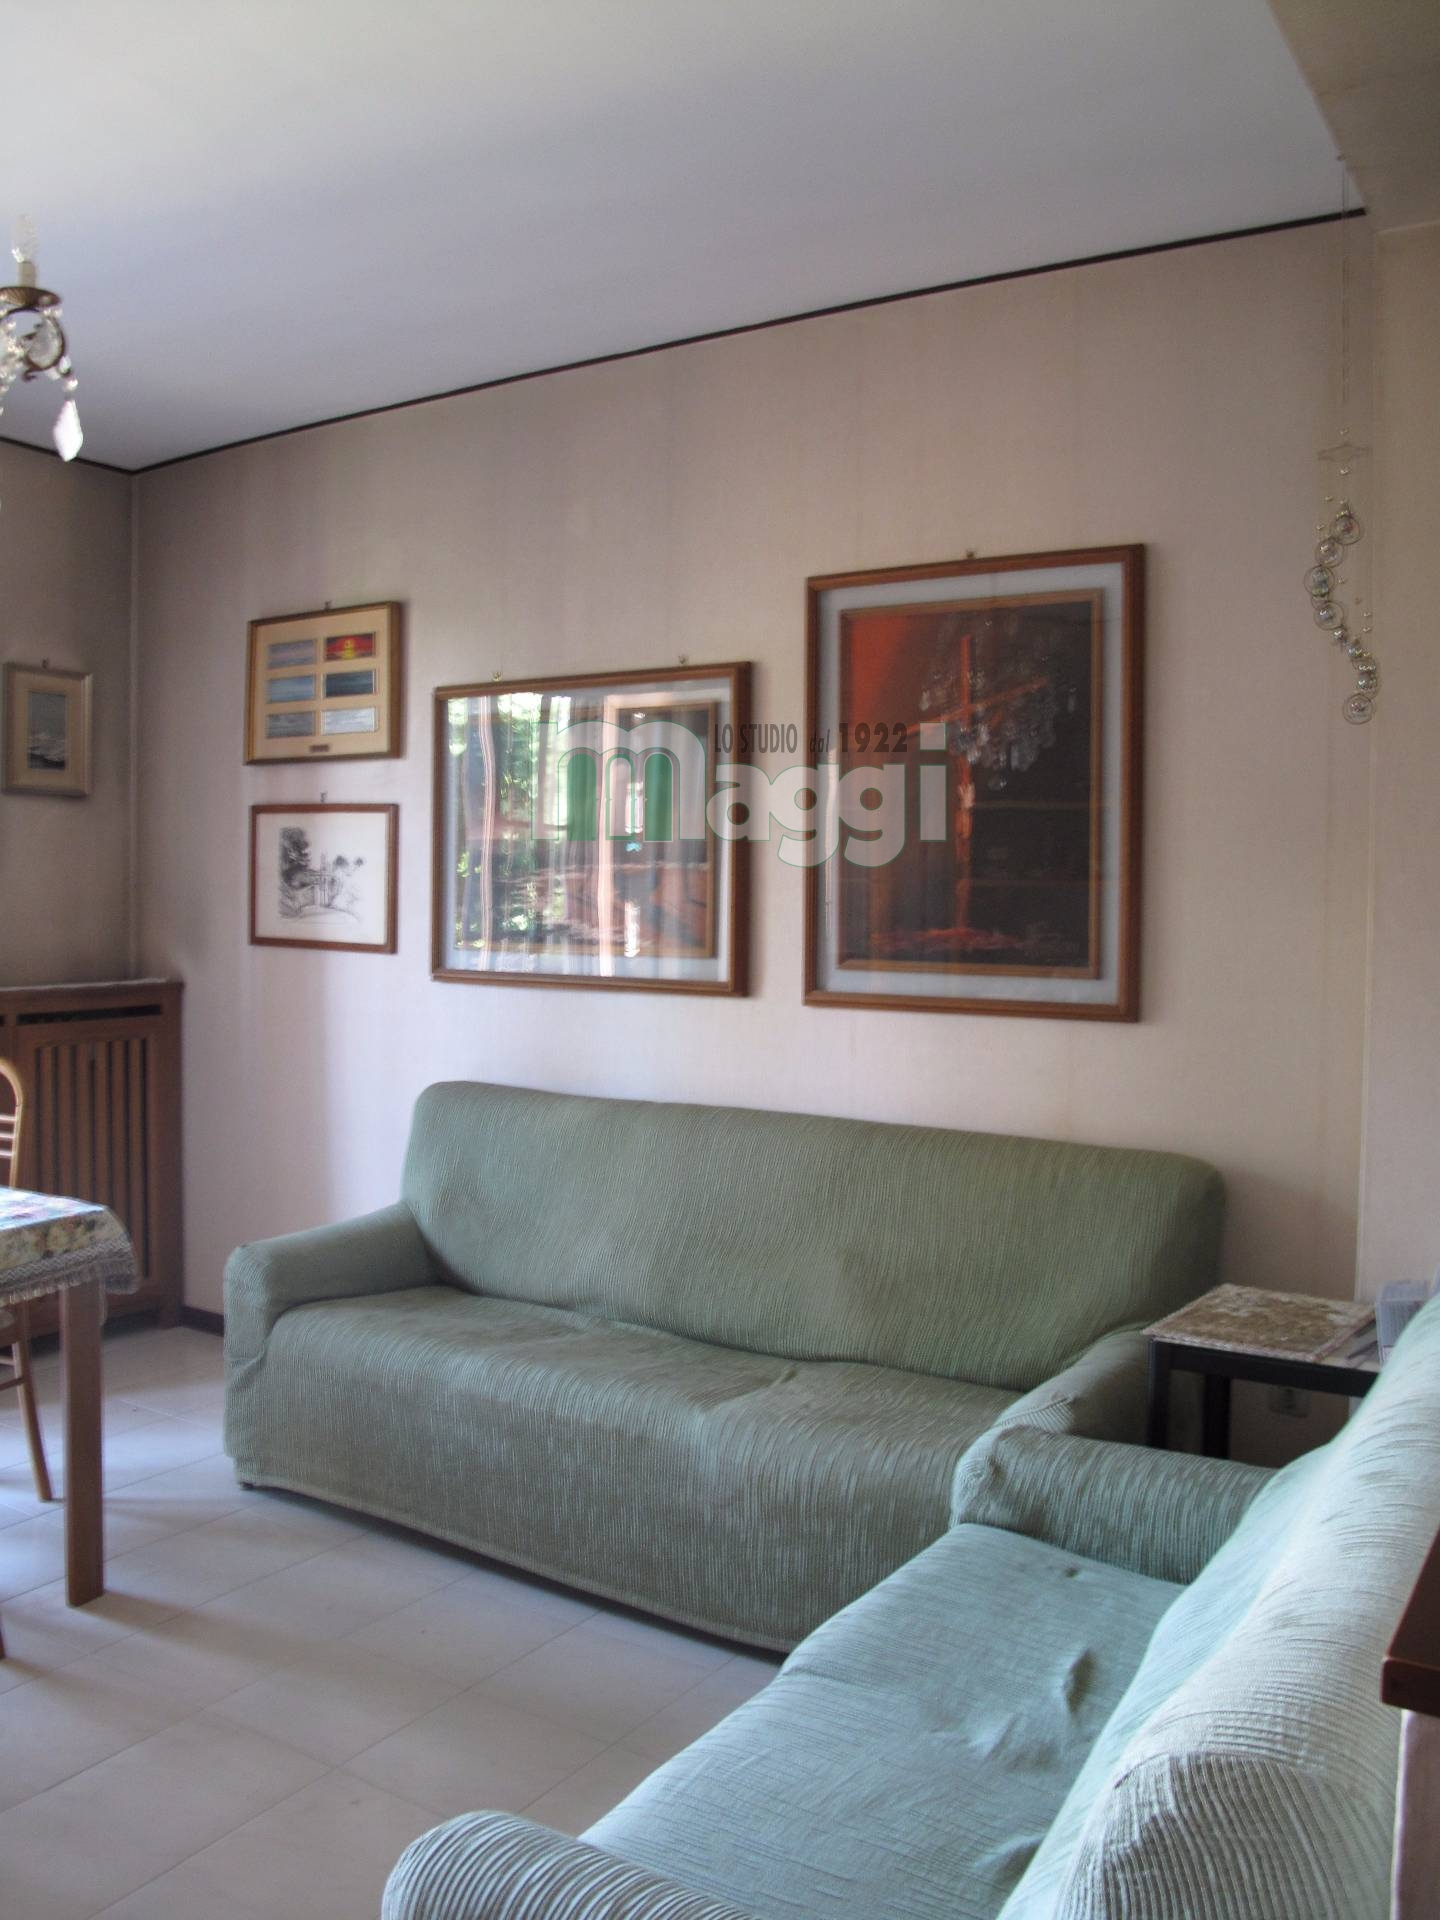 Milano | Appartamento in Vendita in Via Abelardo Pecorini | lacasadimilano.it